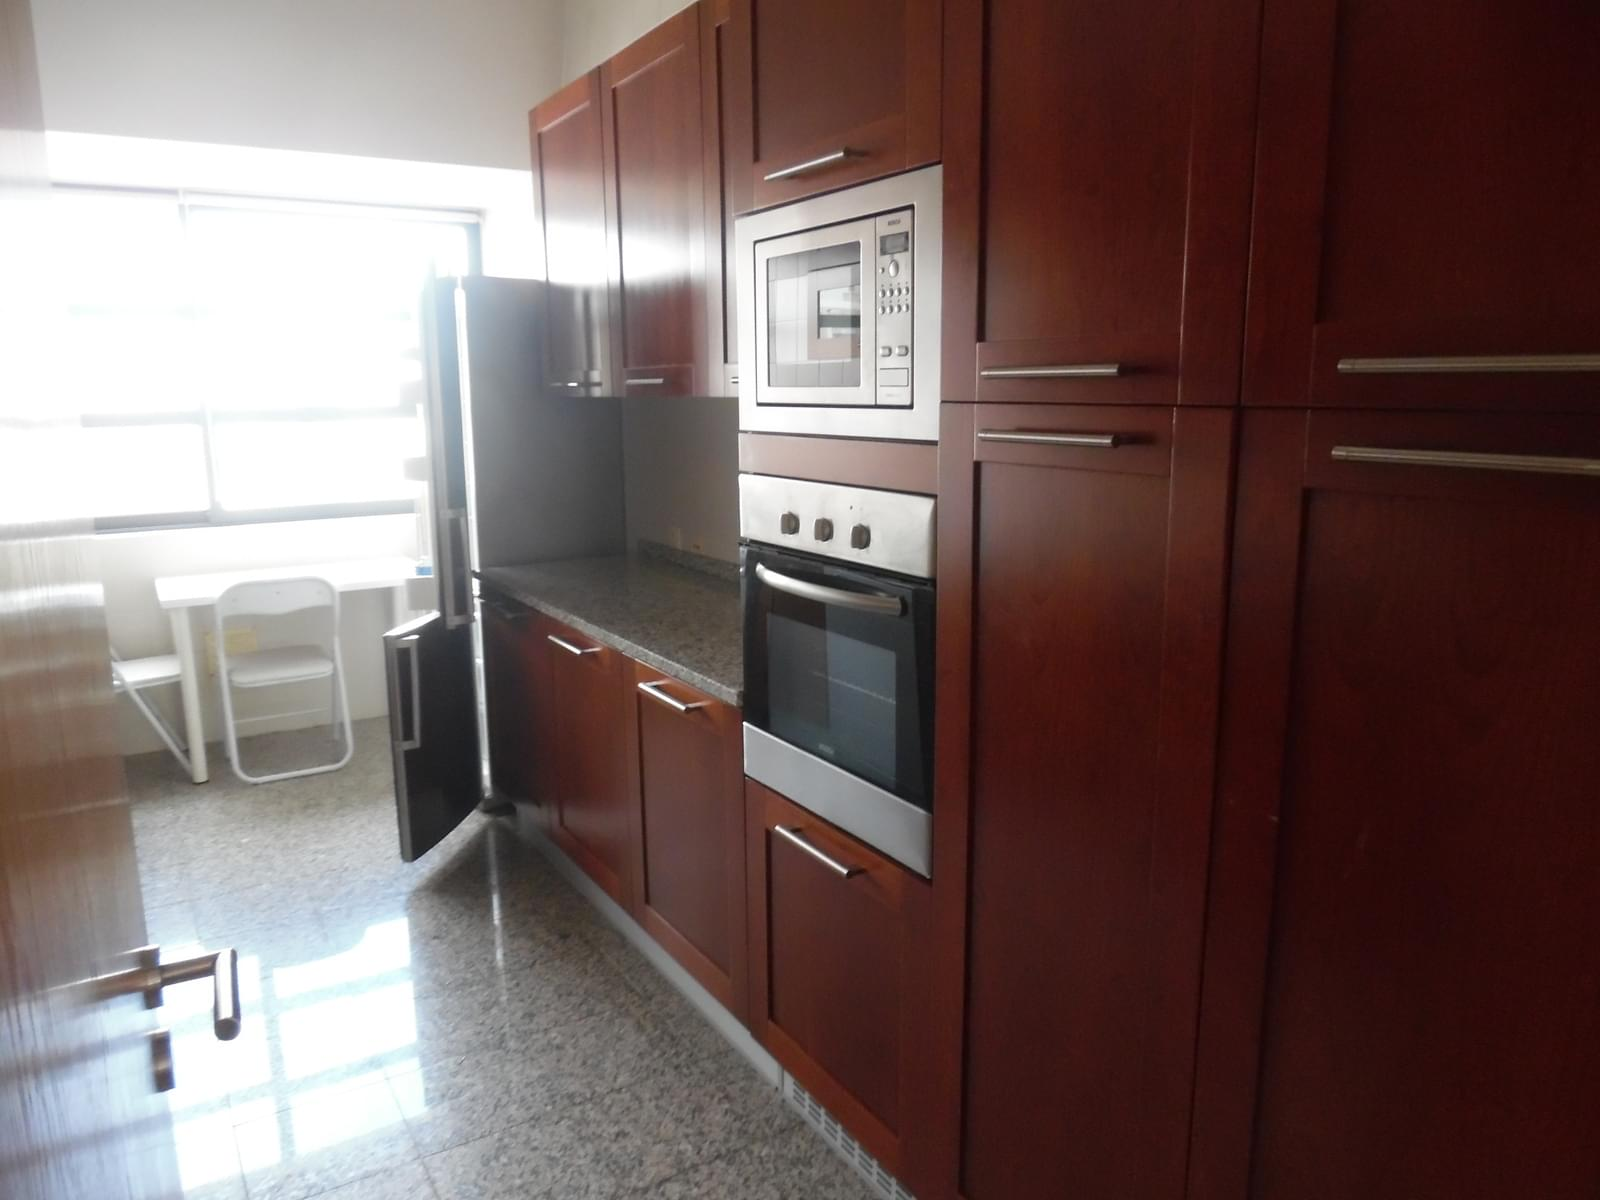 pf18329-apartamento-t1-lisboa-93ae9f5f-4dde-4c72-84e9-b4d2513727c1